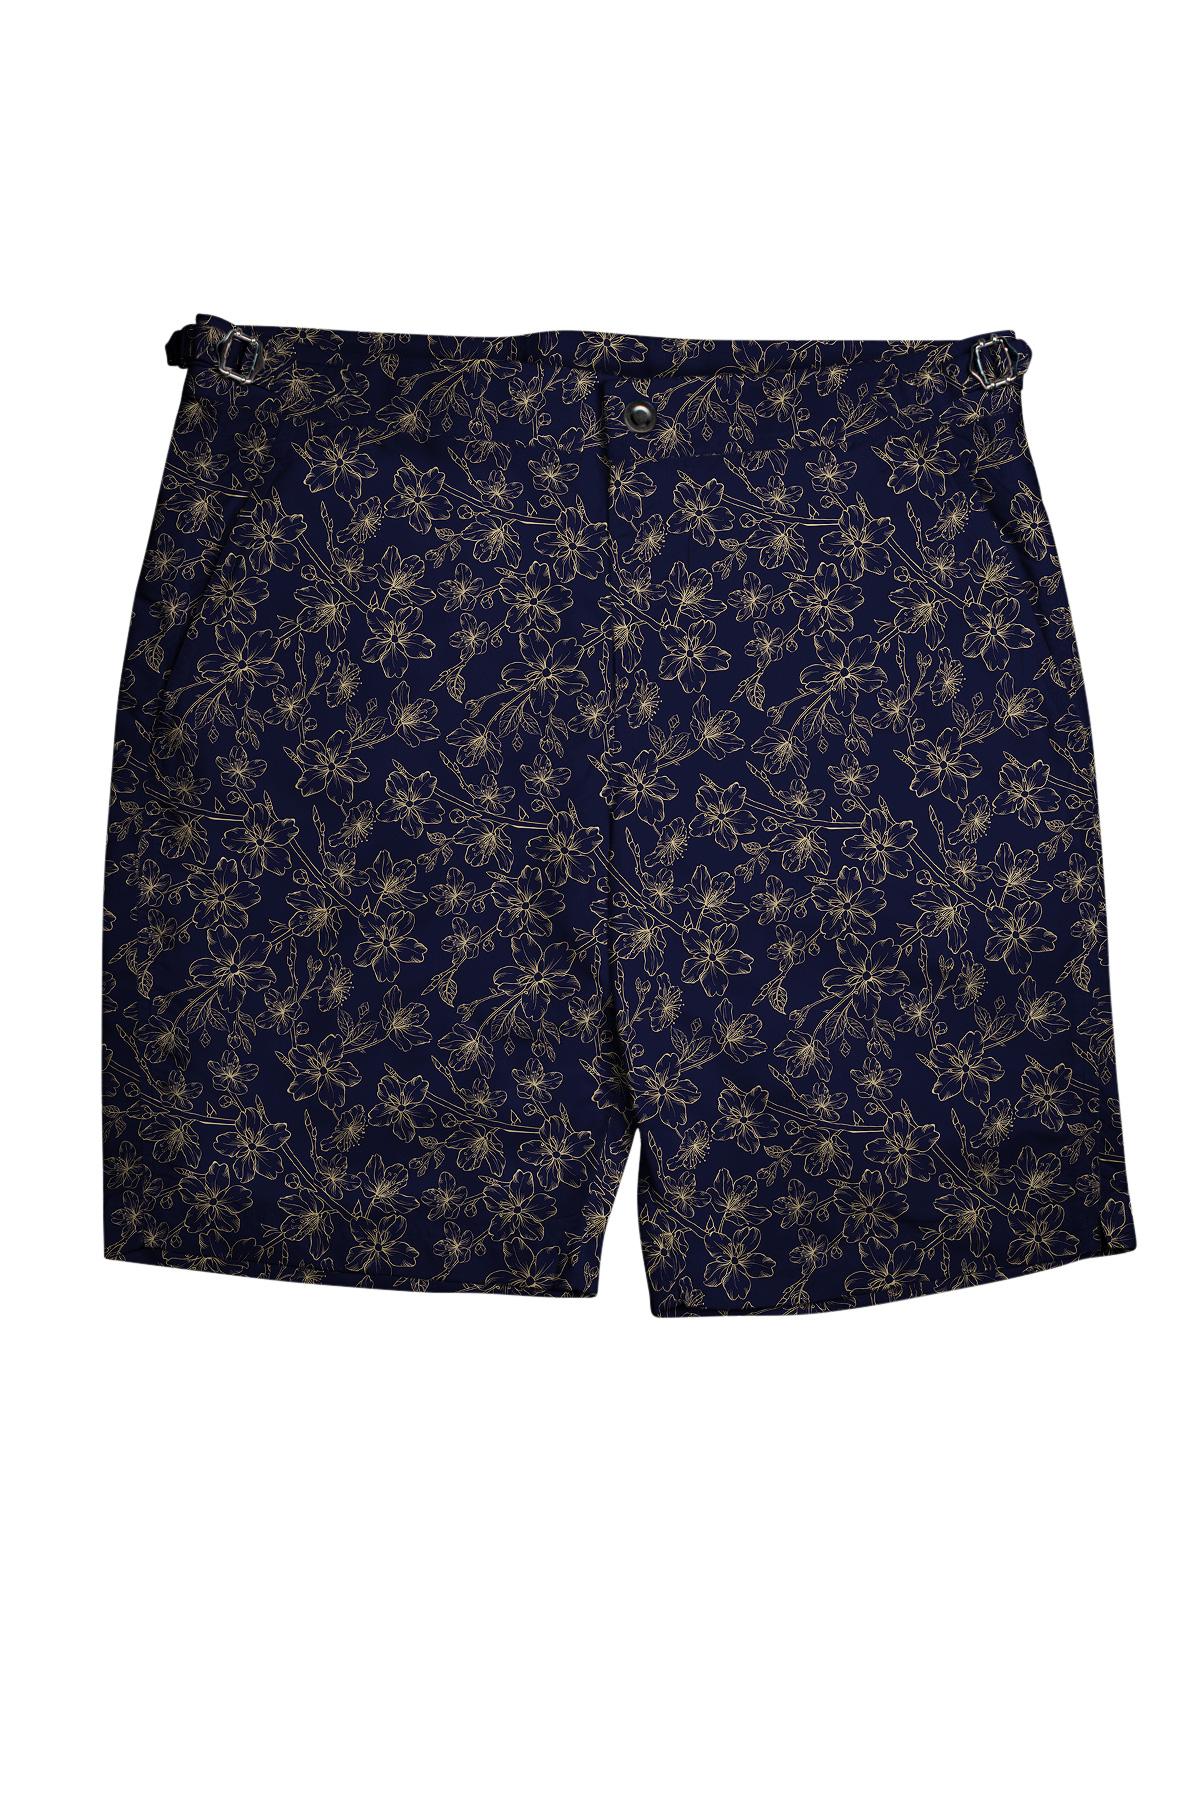 Navy with Tonal Gold Flowers Swim Shorts